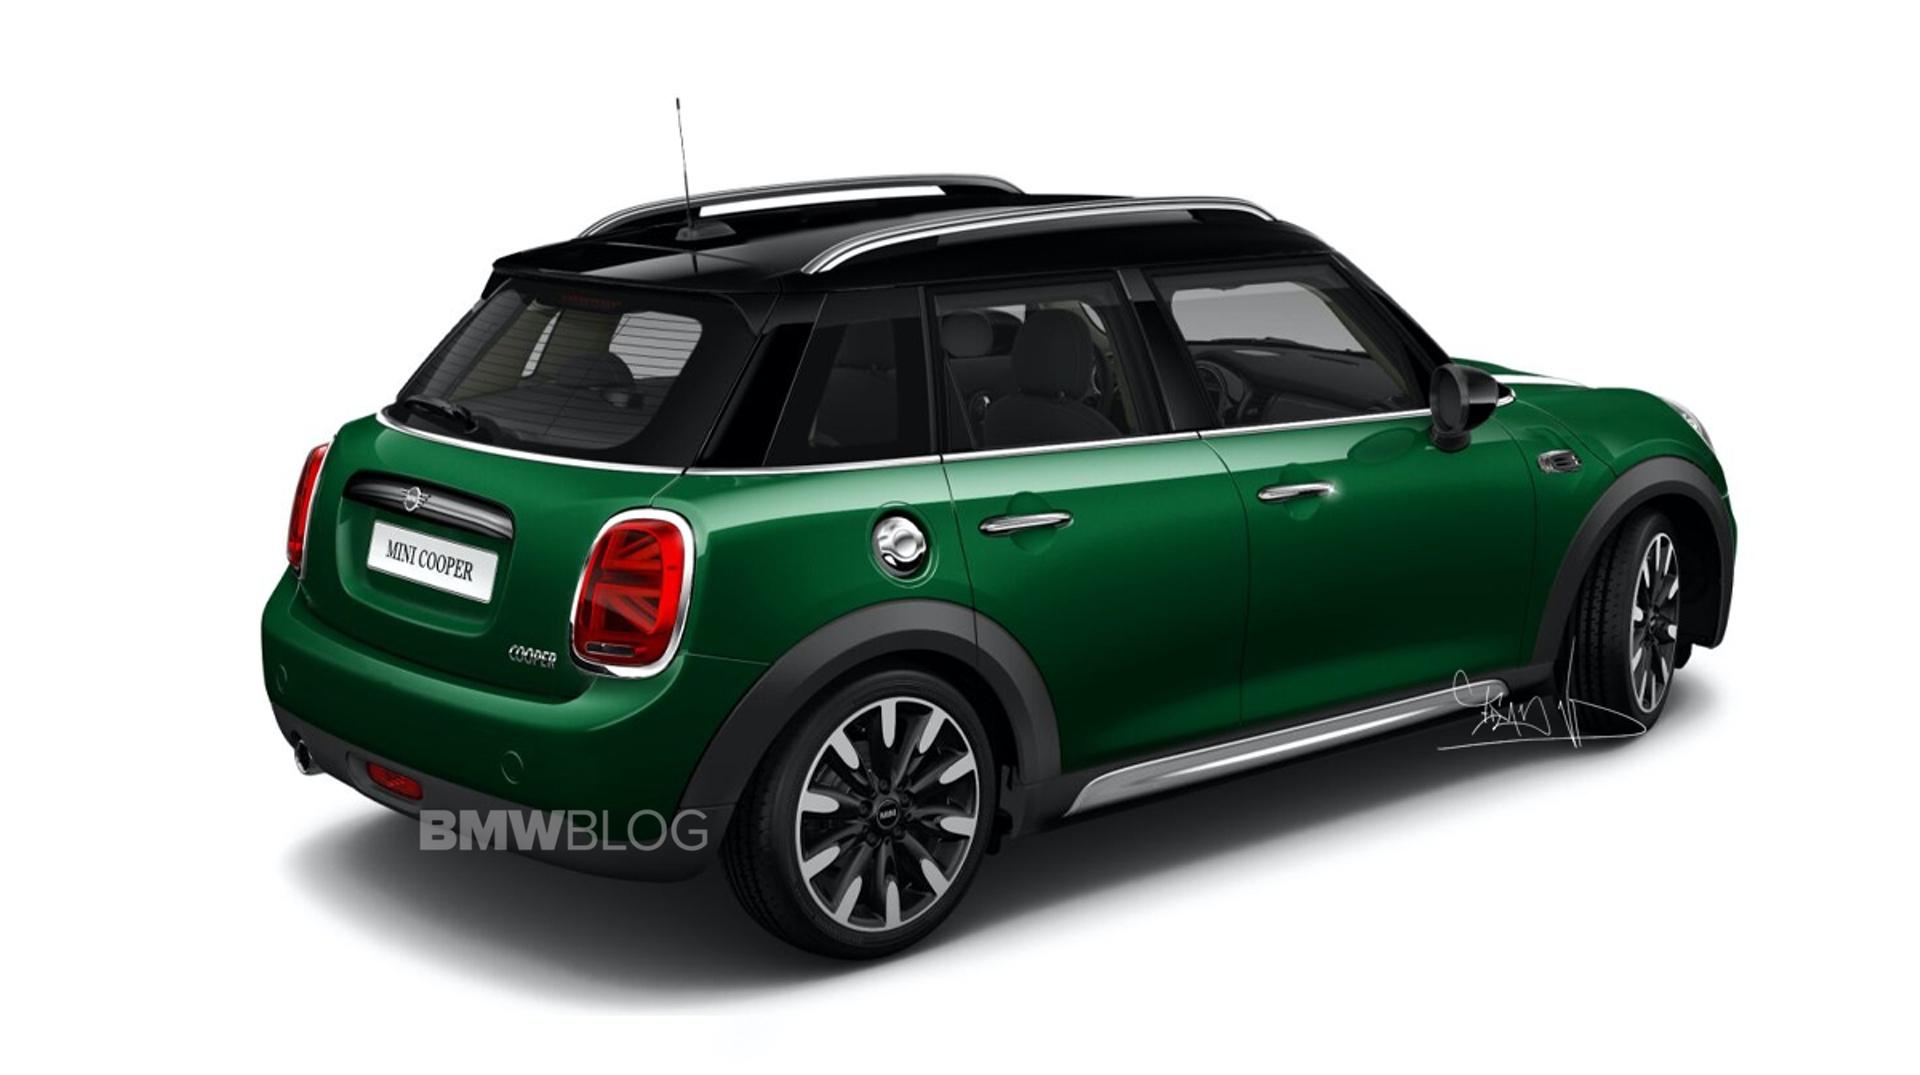 Rumor Mini Prepares An Urban Crossover To Face The Audi A1 Citycarver